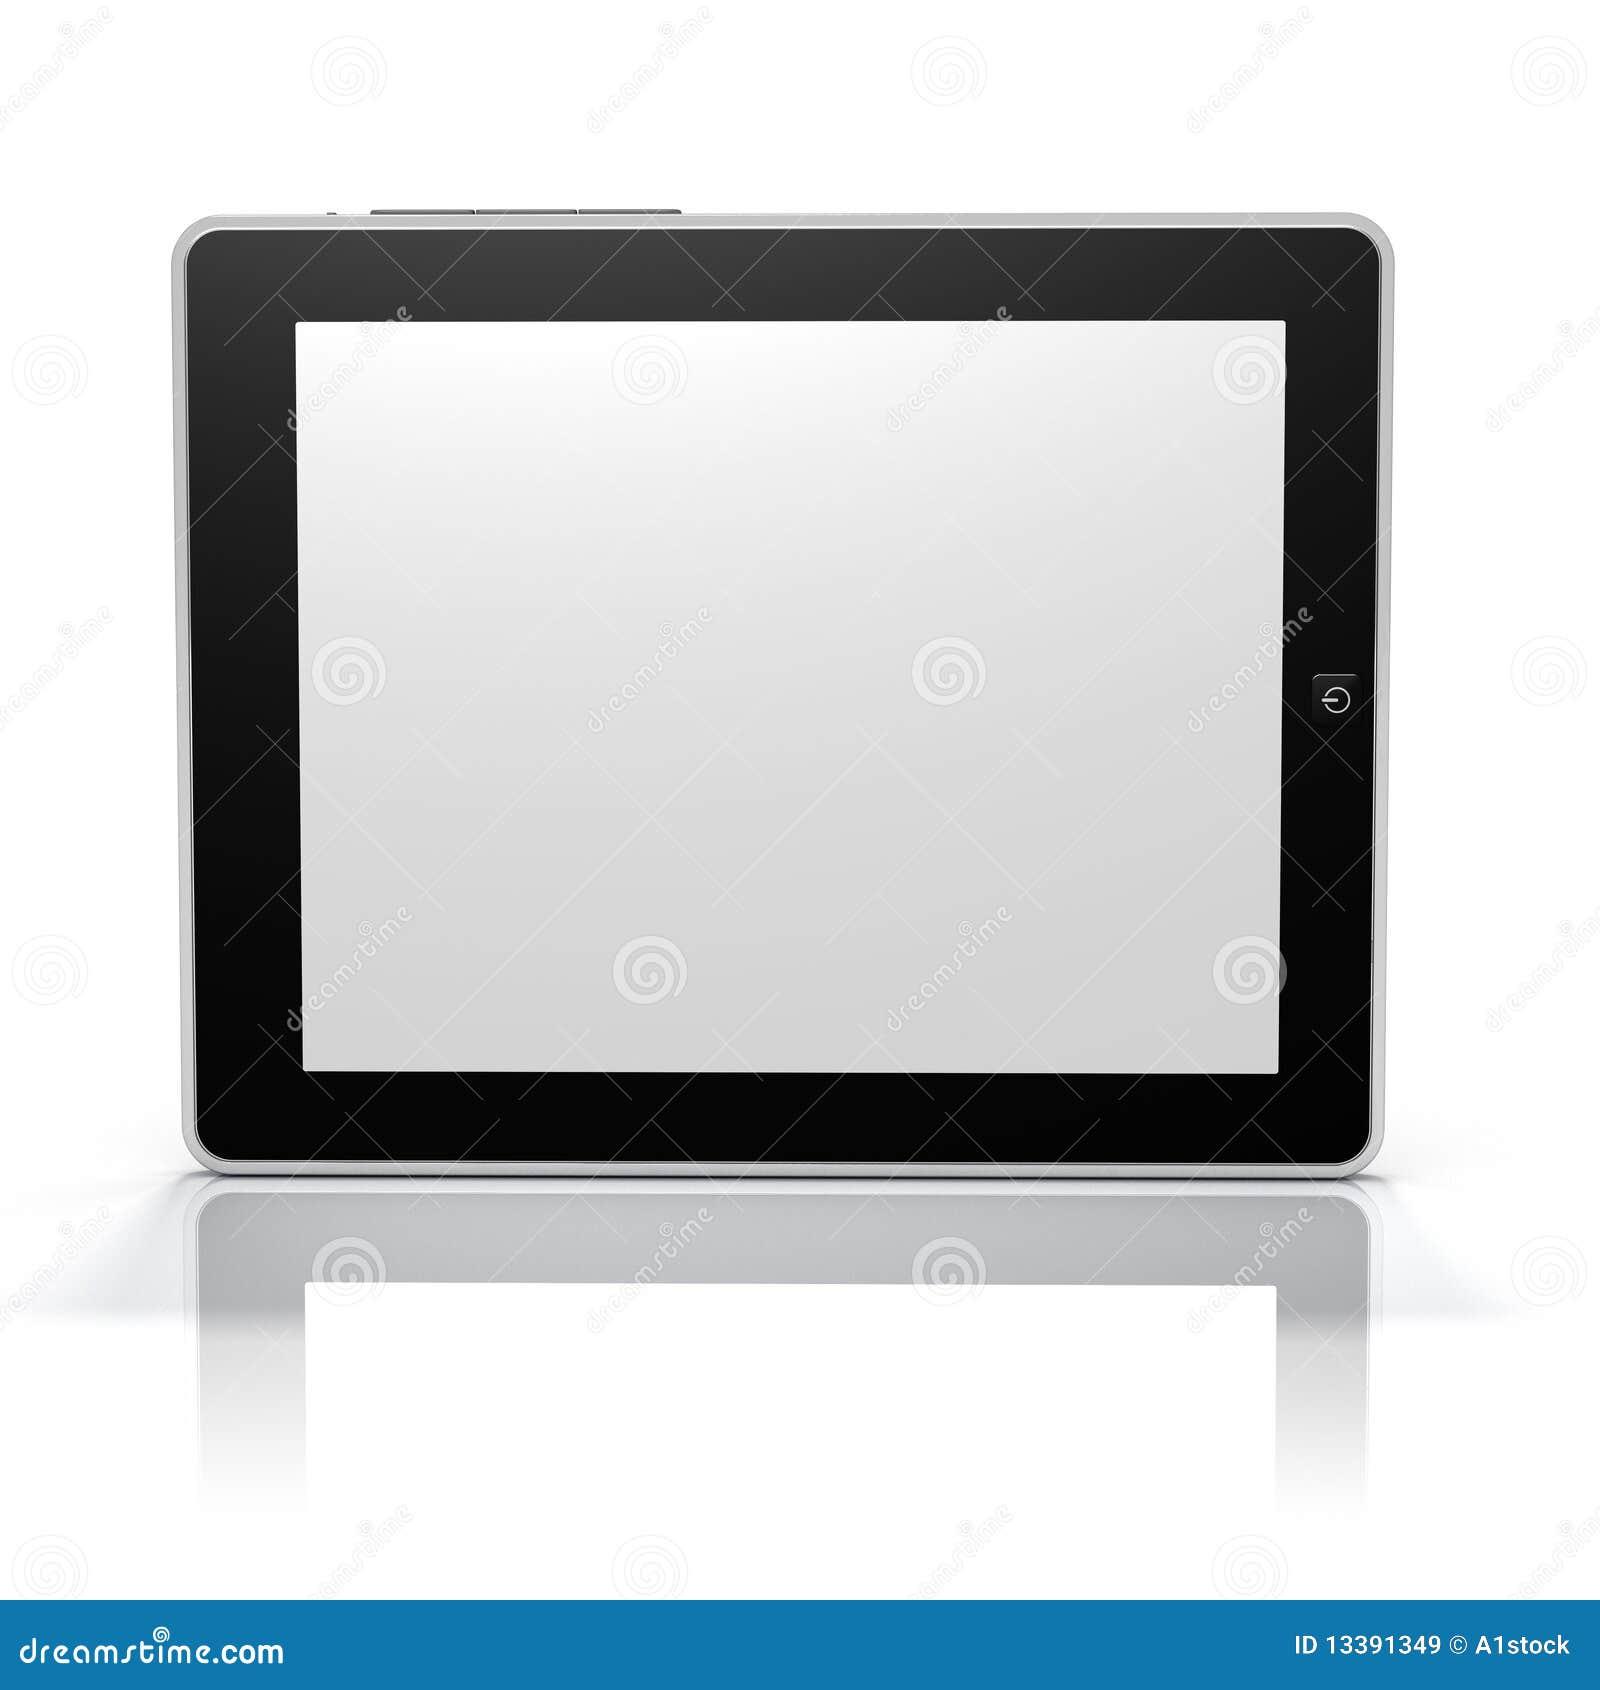 Cara de la pantalla de la PC de la tablilla (pantalla y objeto del camino del clip)